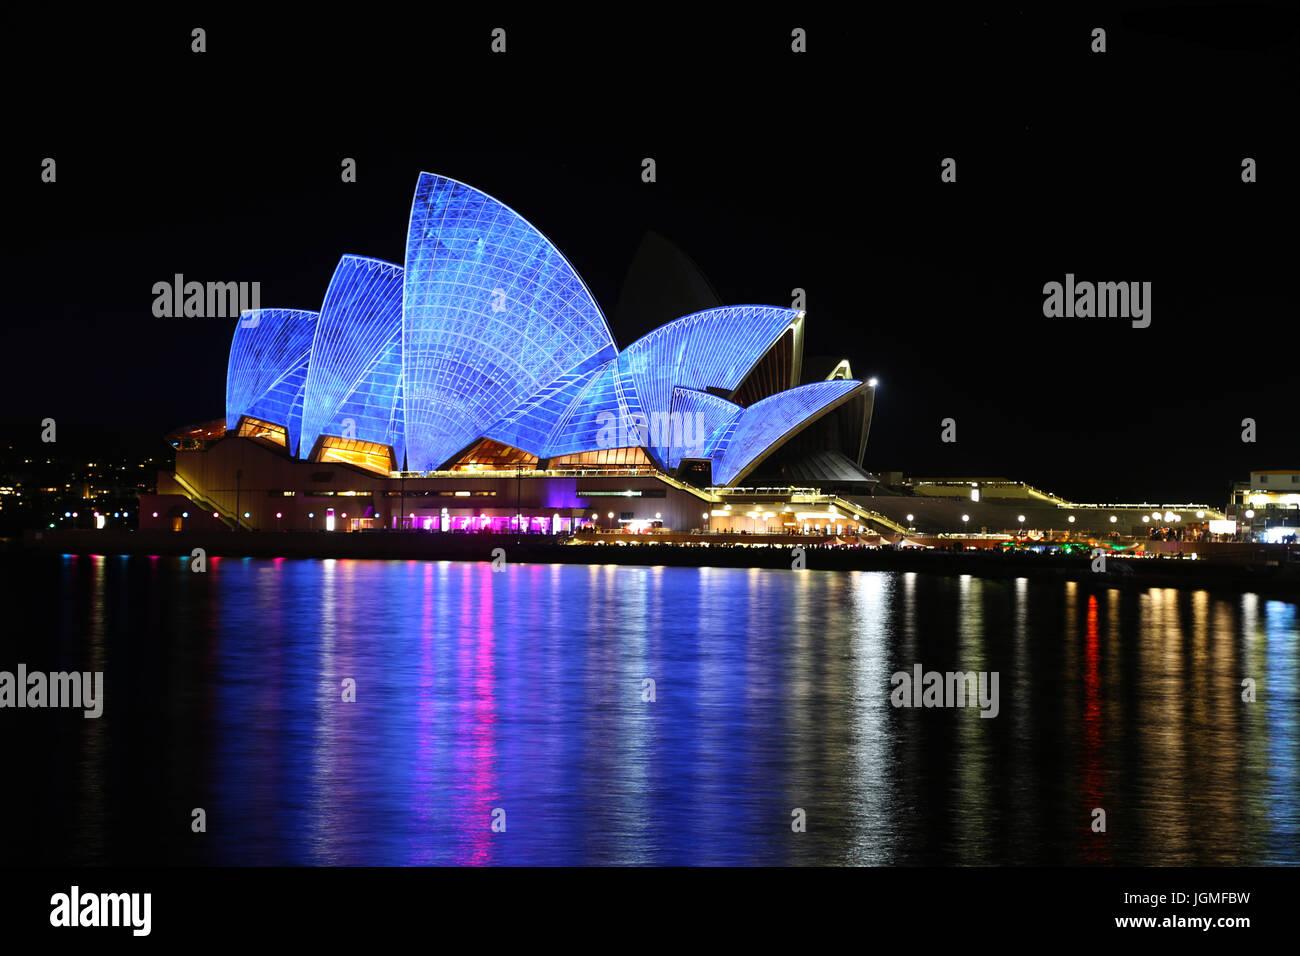 Australia Sydney Opera House immagine notturna Immagini Stock